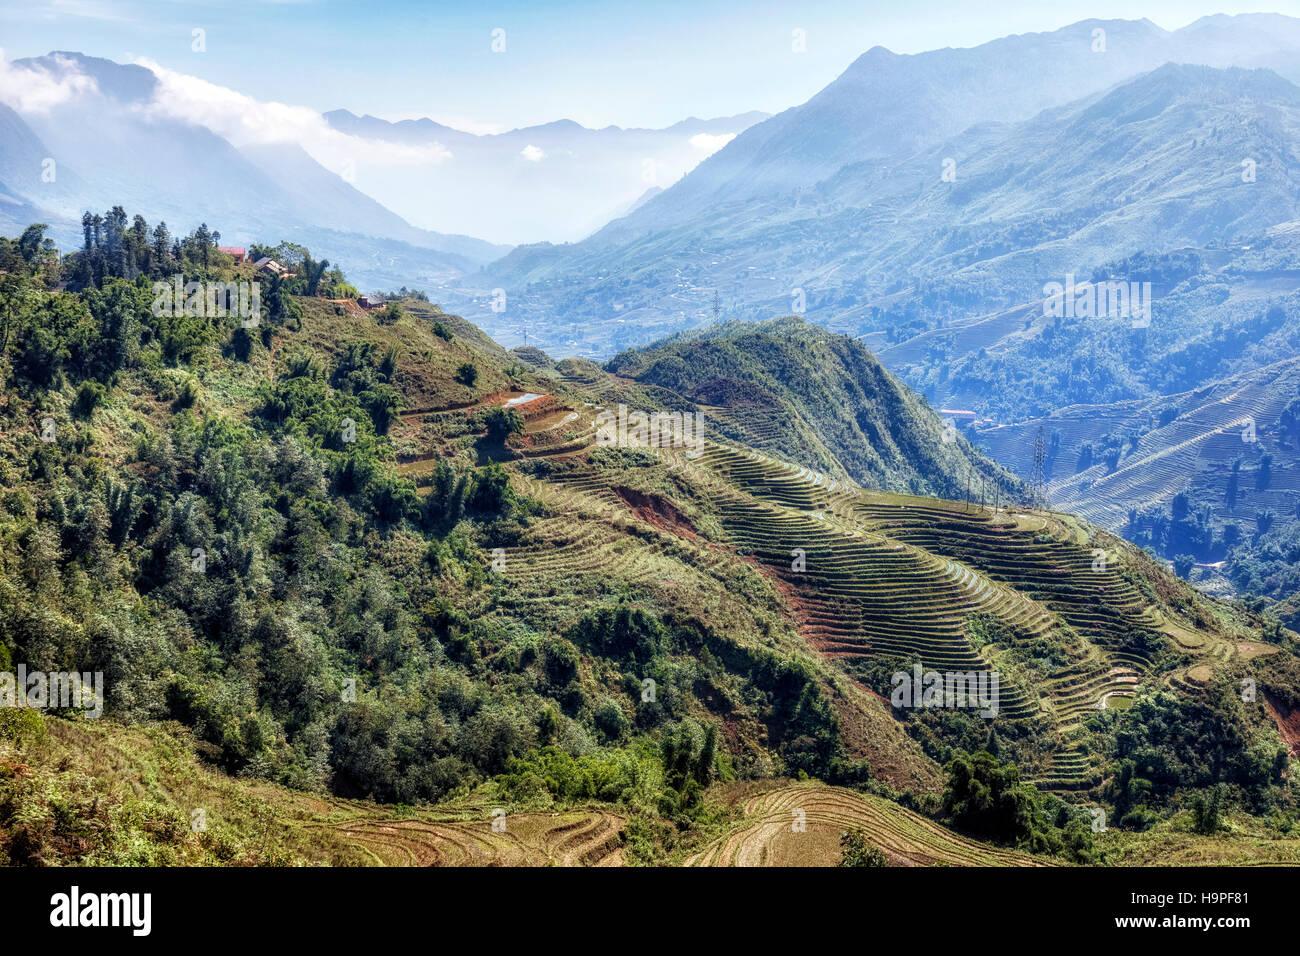 Rice terraces, Lao Chai, Sapa, Vietnam, Asia - Stock Image